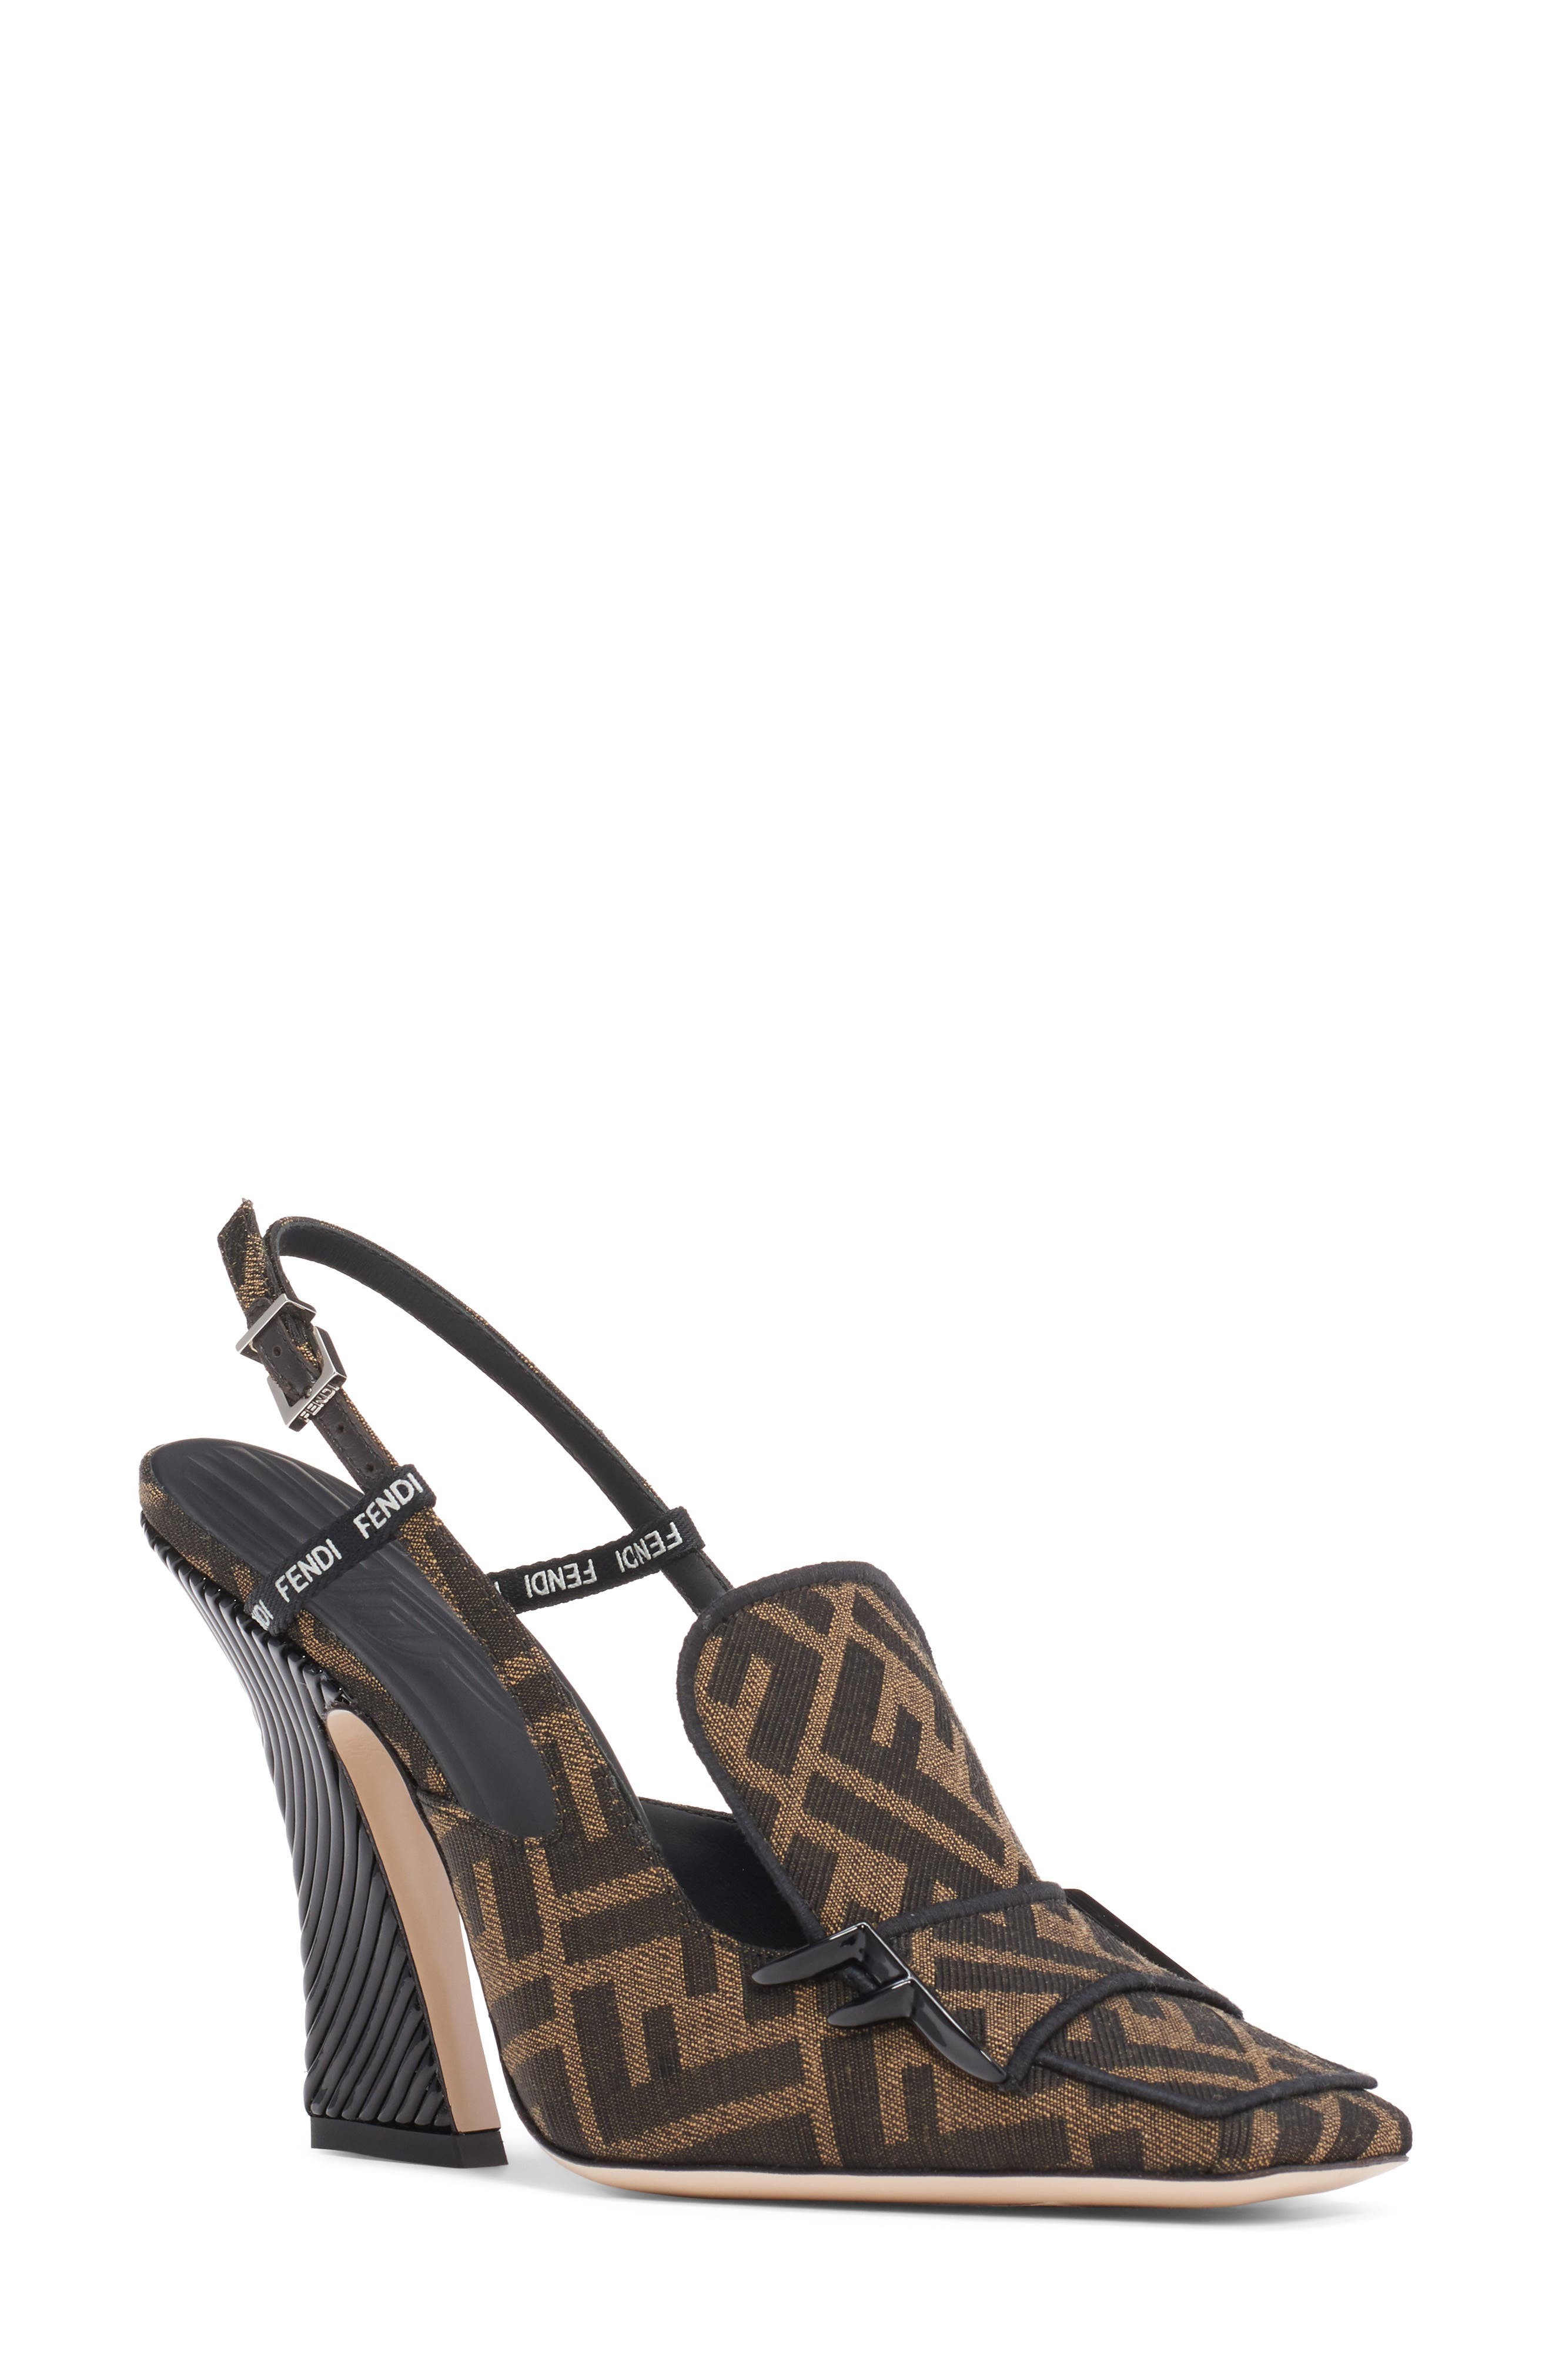 Fendi Ffreedom Ff Slingback Loafer Pump, Black